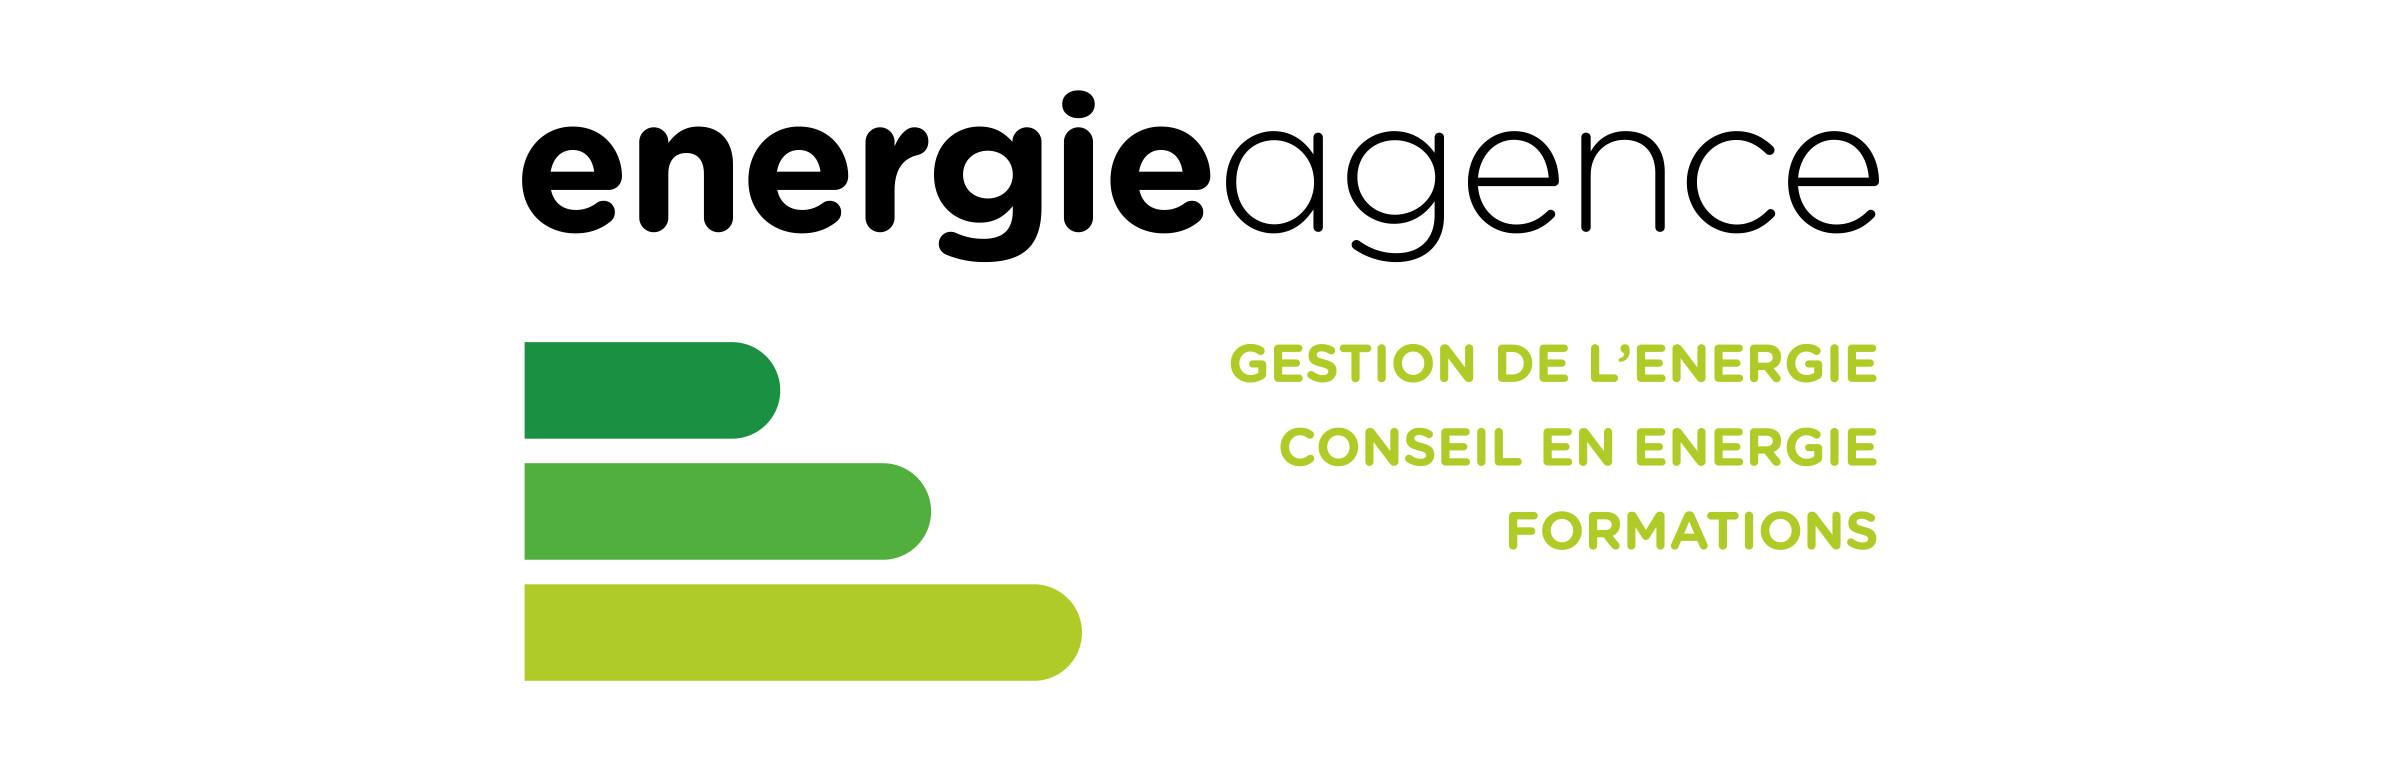 Banner Agence de l'Energie